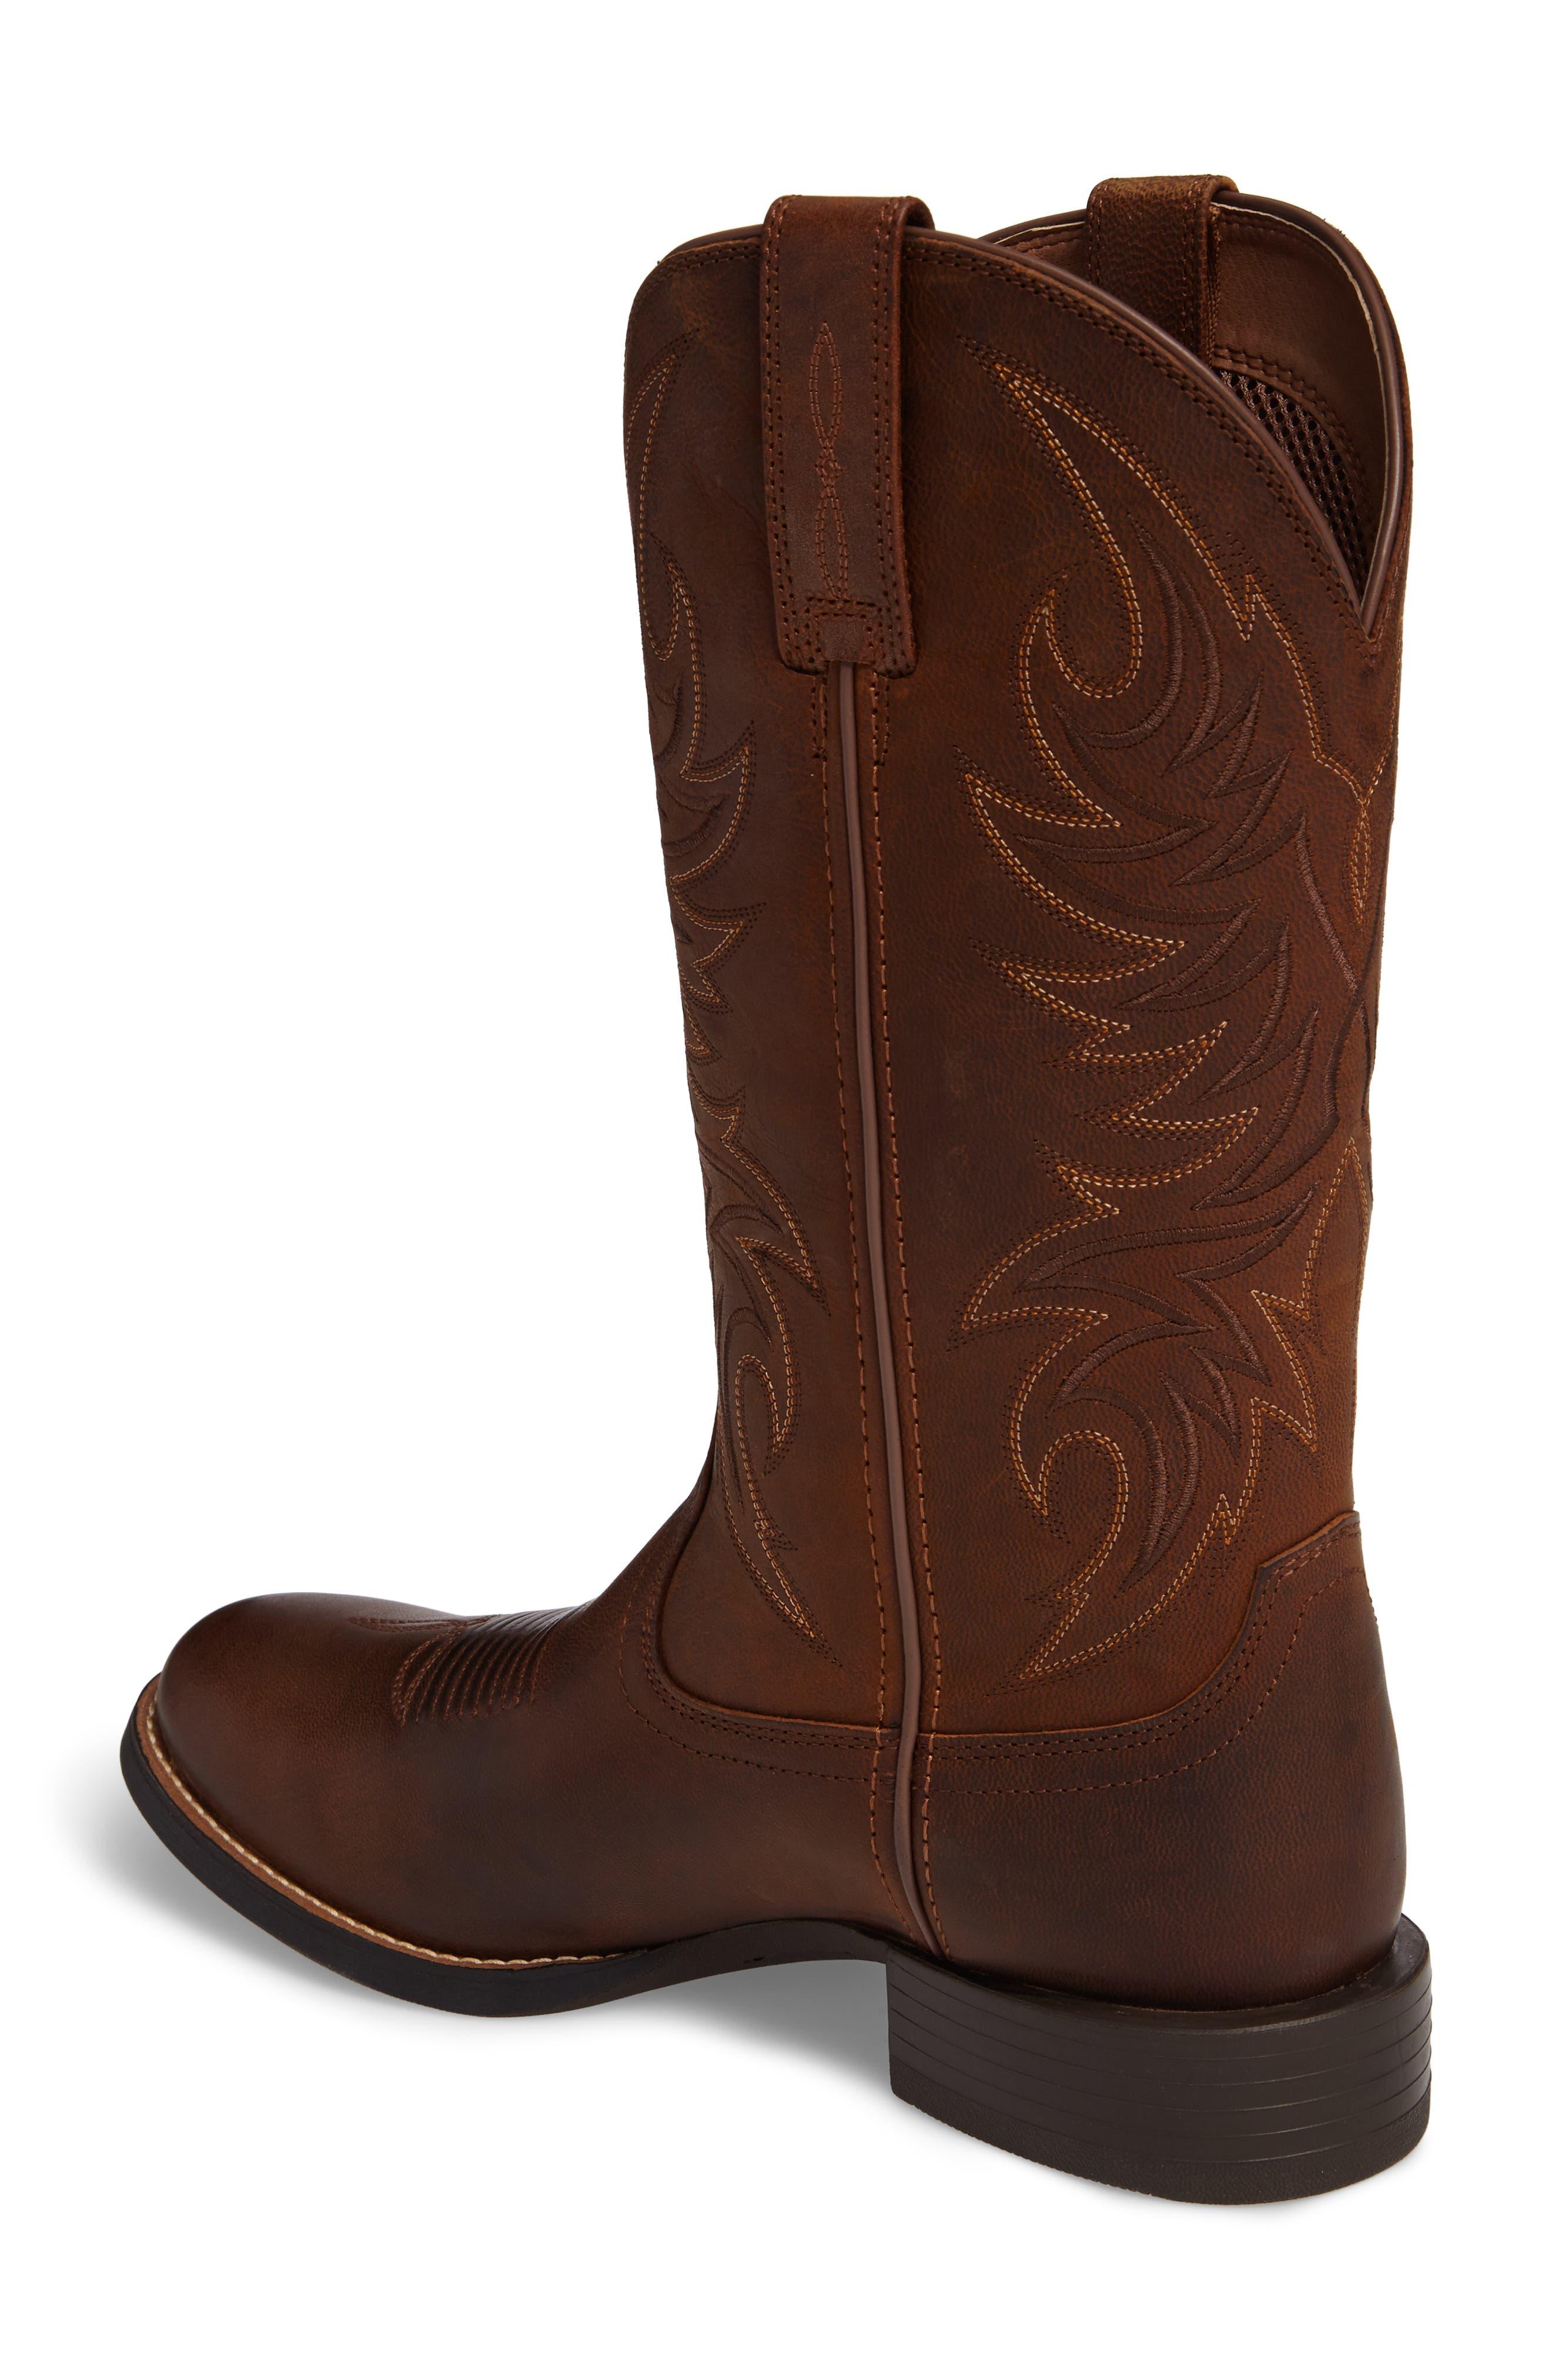 Sport Horsemen Cowboy Boot,                             Alternate thumbnail 2, color,                             RAFTER TAN